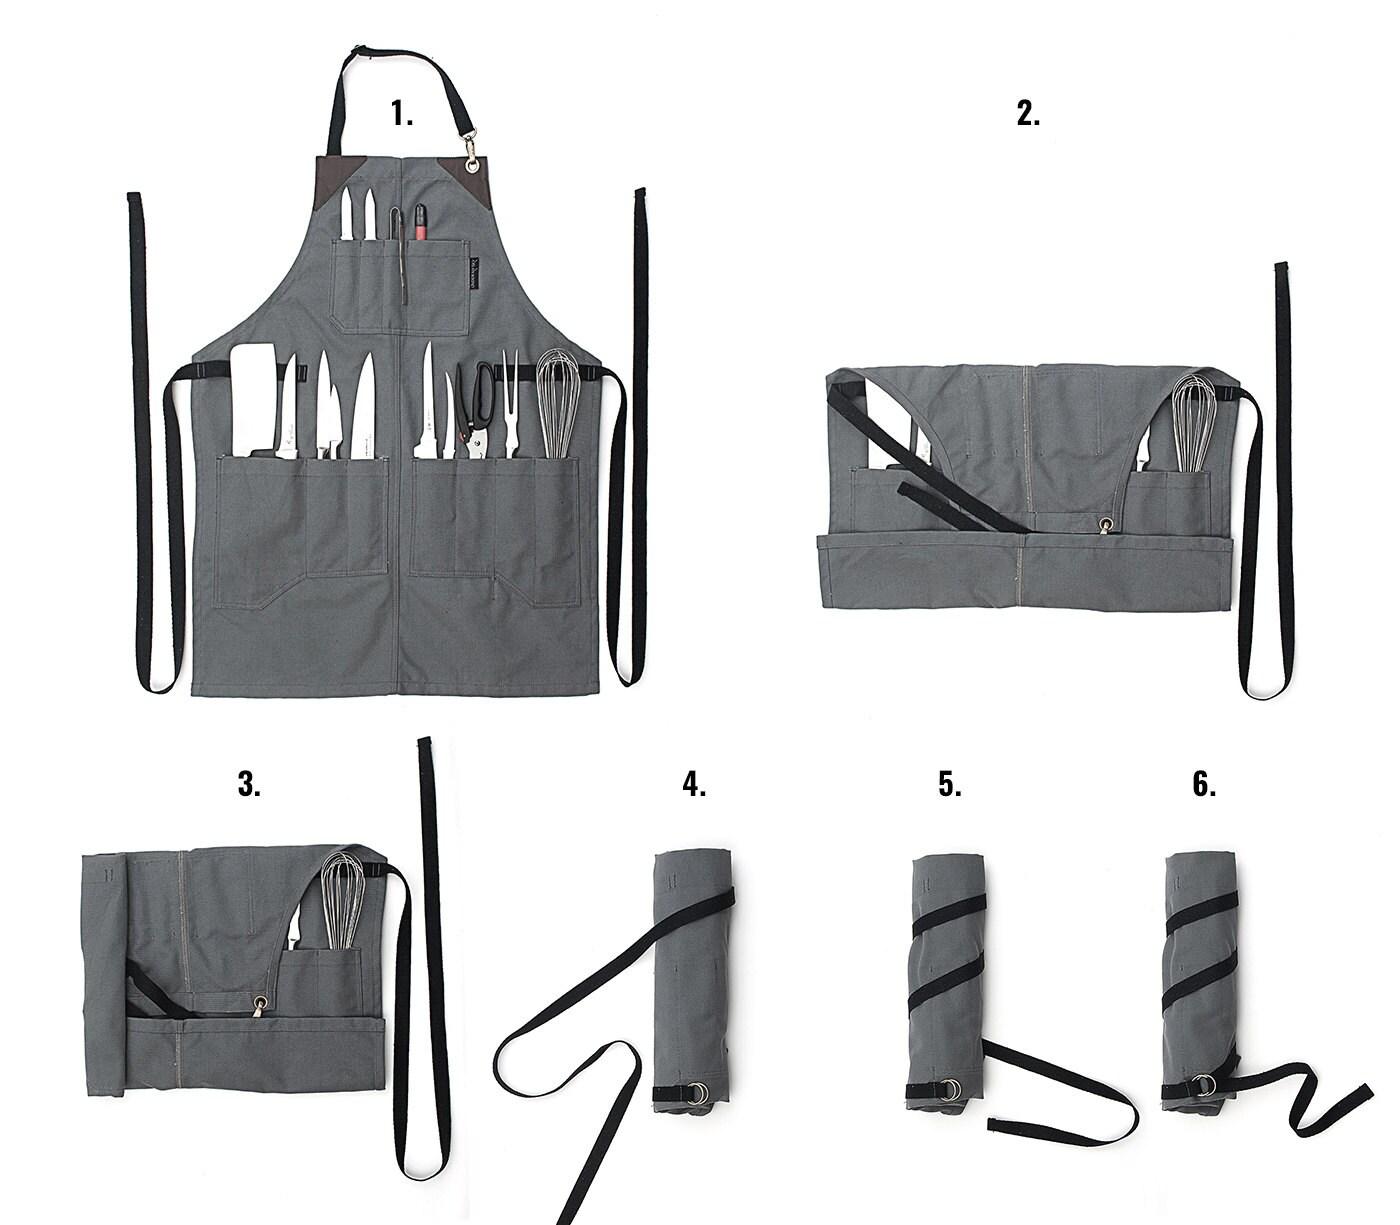 Blue apron kidd -  64 99